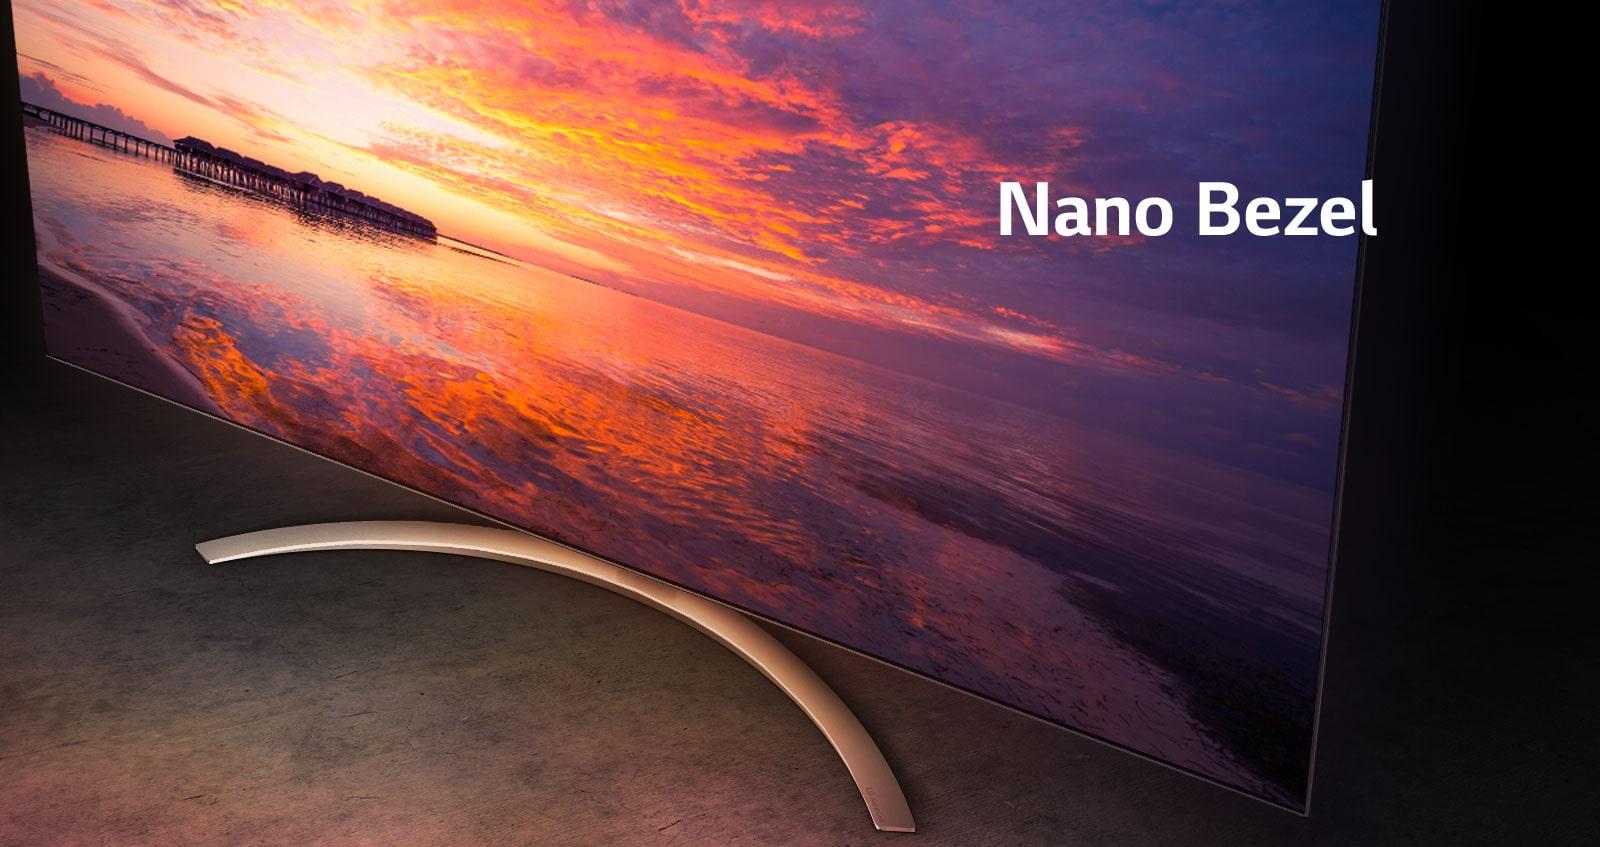 TV-NanoCell-SM81-09-Nano-Bezel-Desktop_v1